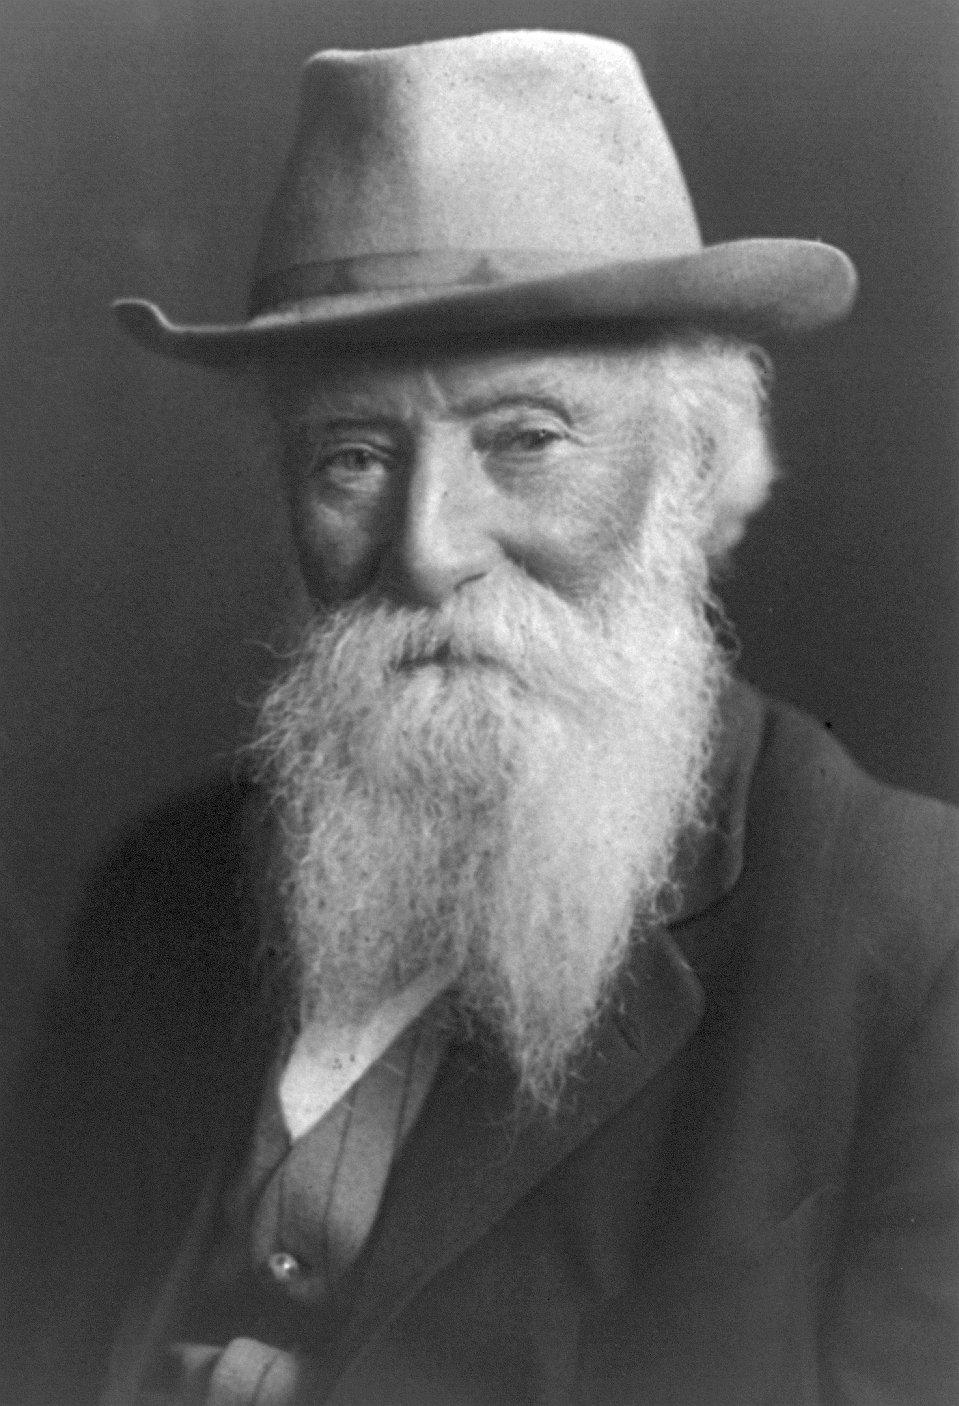 image of John Burroughs